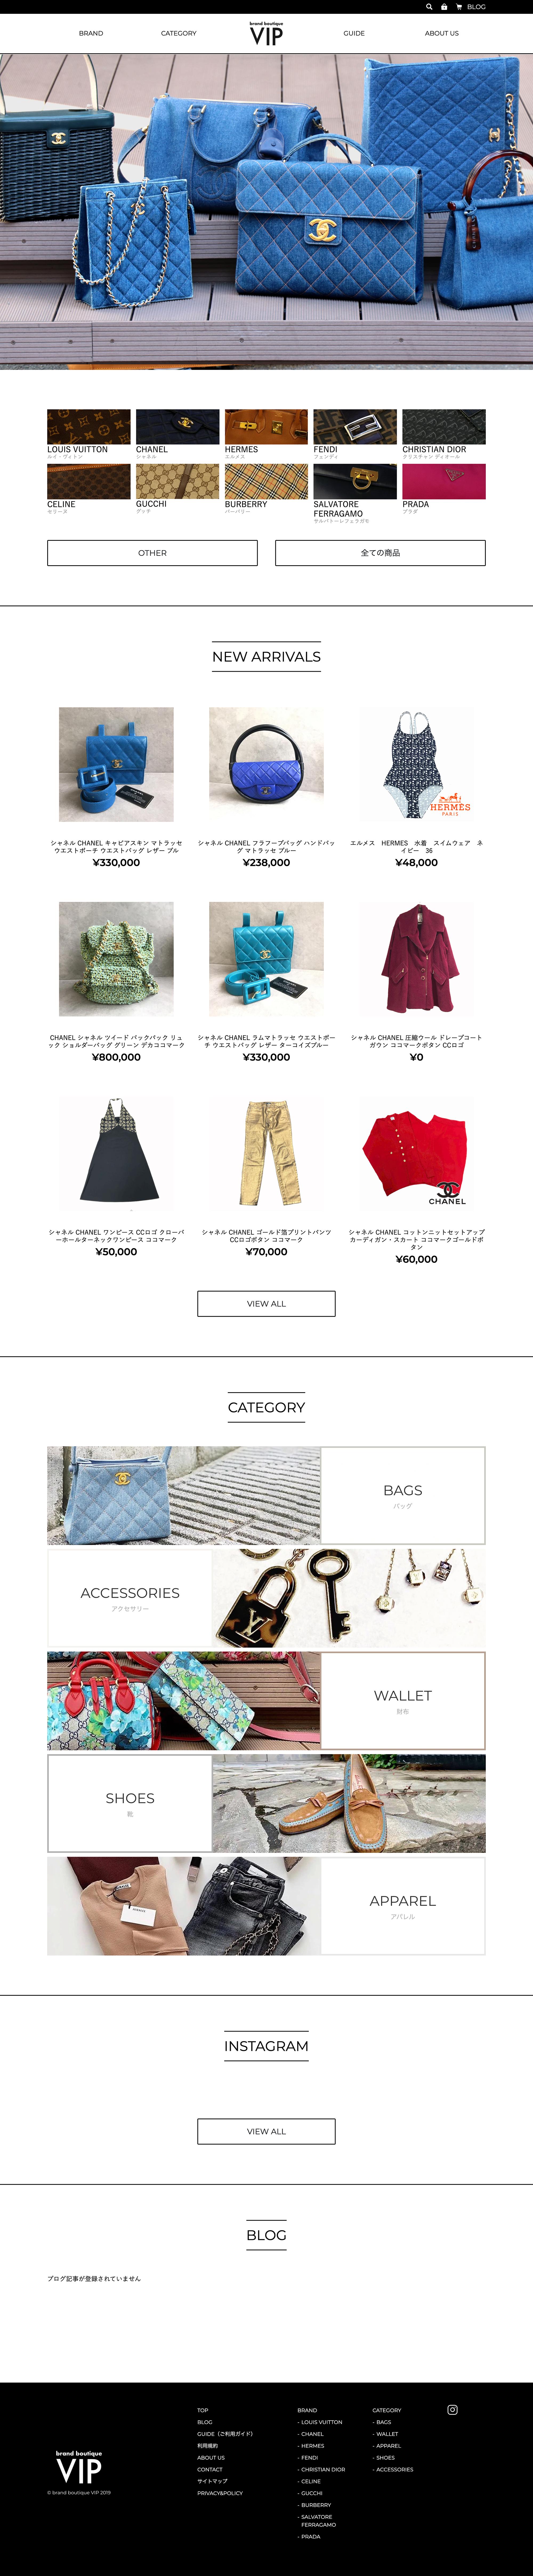 brand boutiqueVIP様 ホームページ PC画像